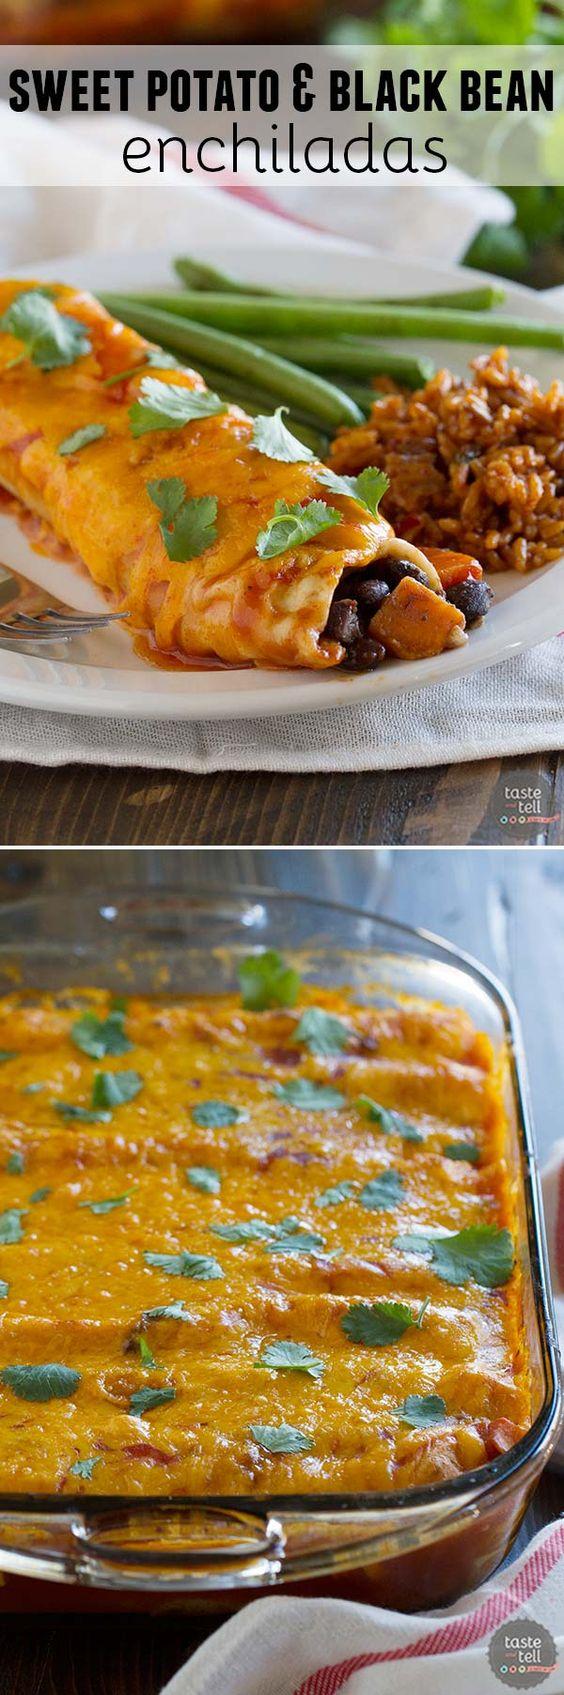 enchiladas bean enchiladas recipe vegetarian sweets sweet enchiladas ...